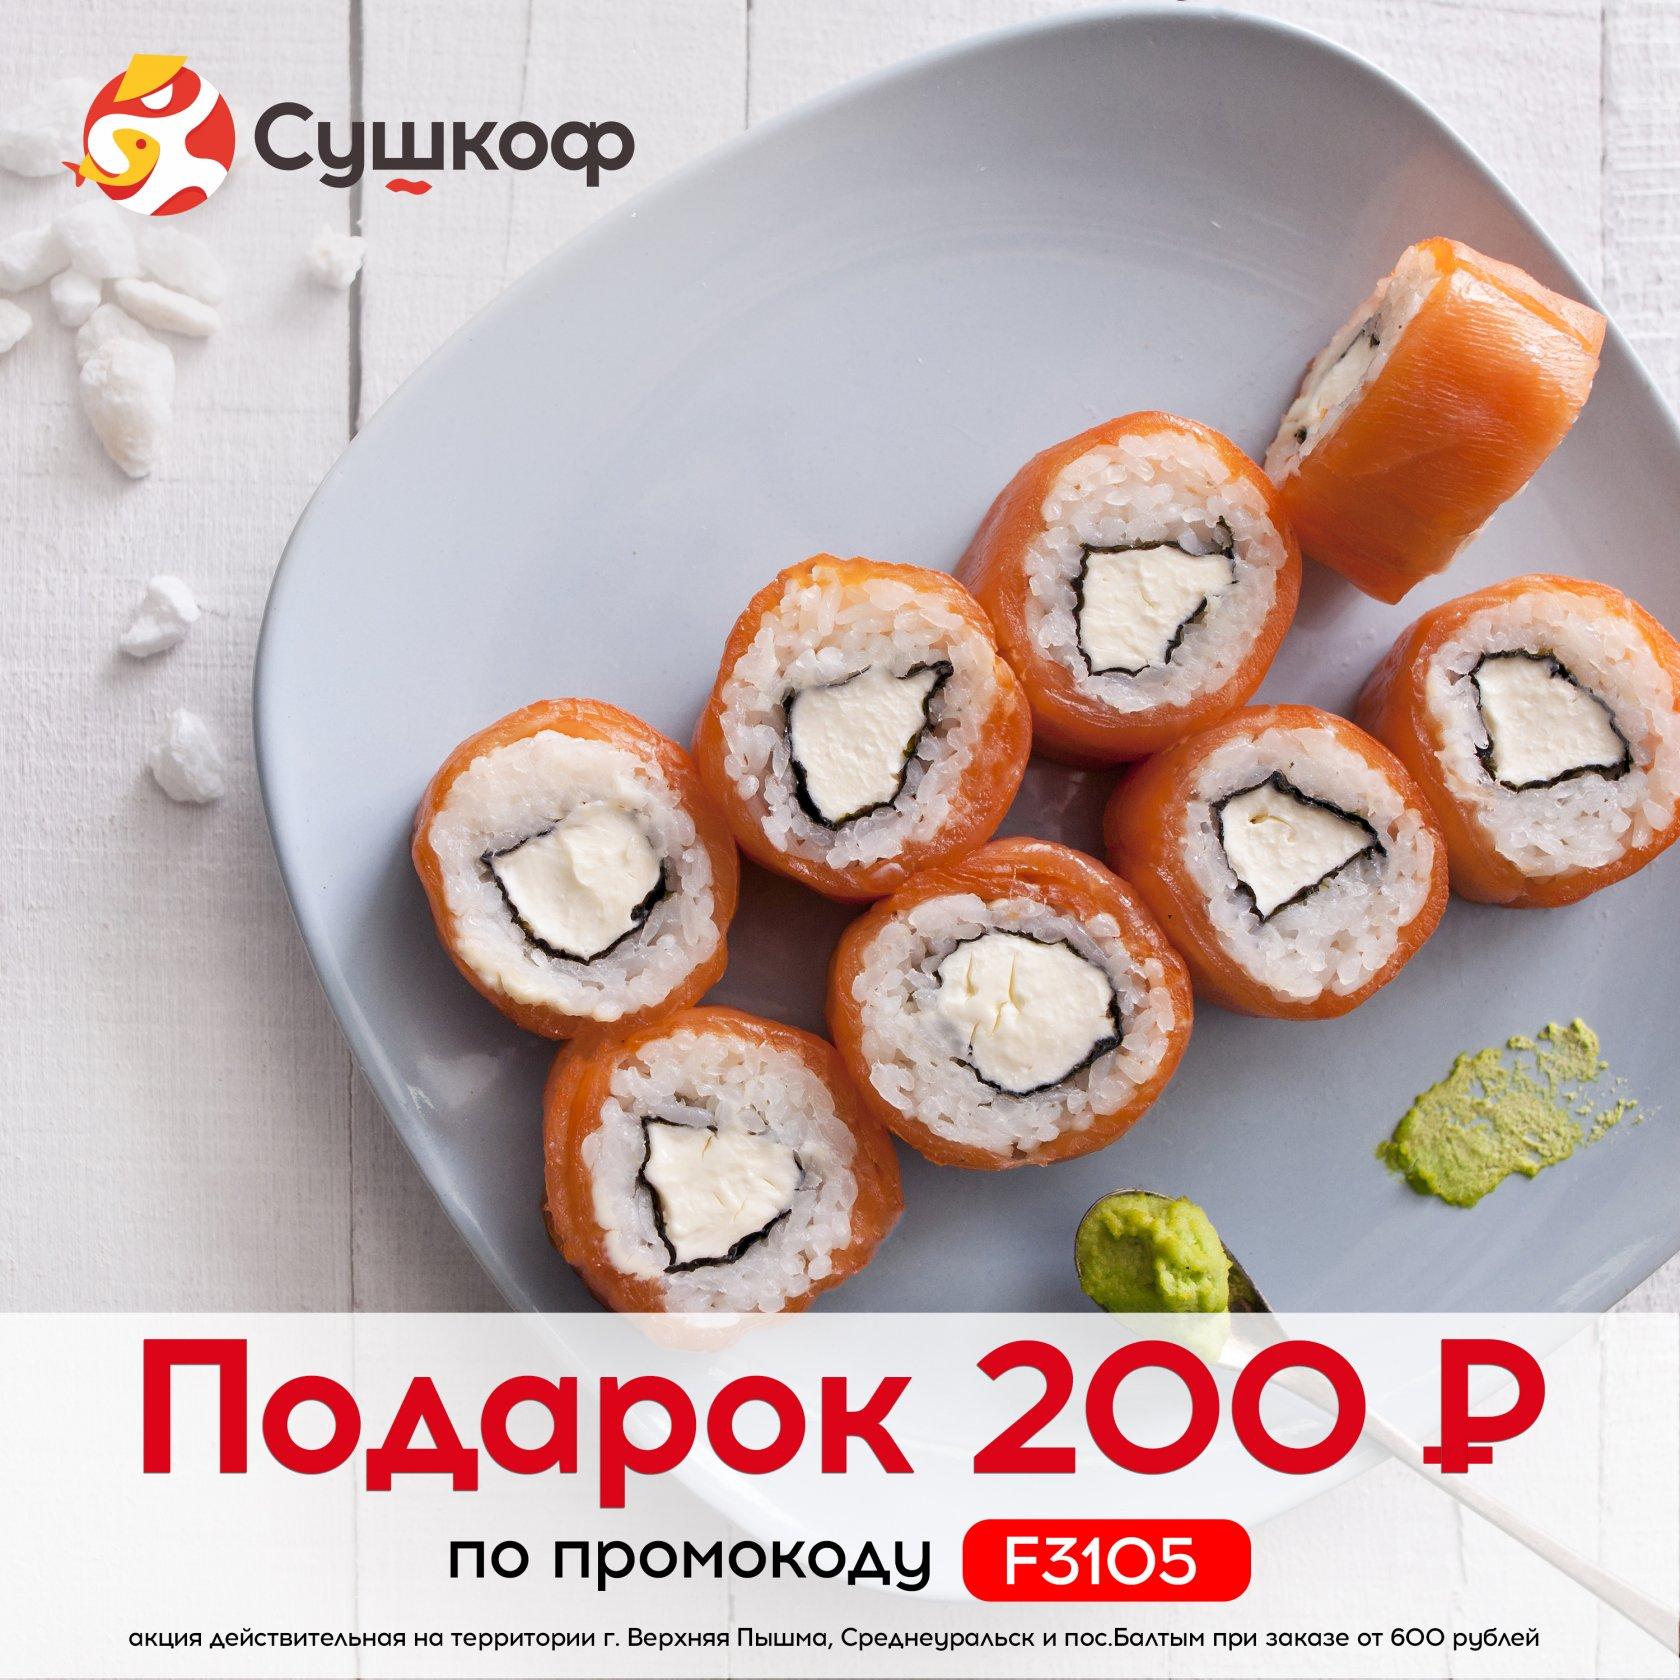 Performance marketing для сети ресторанов «Сушкоф»